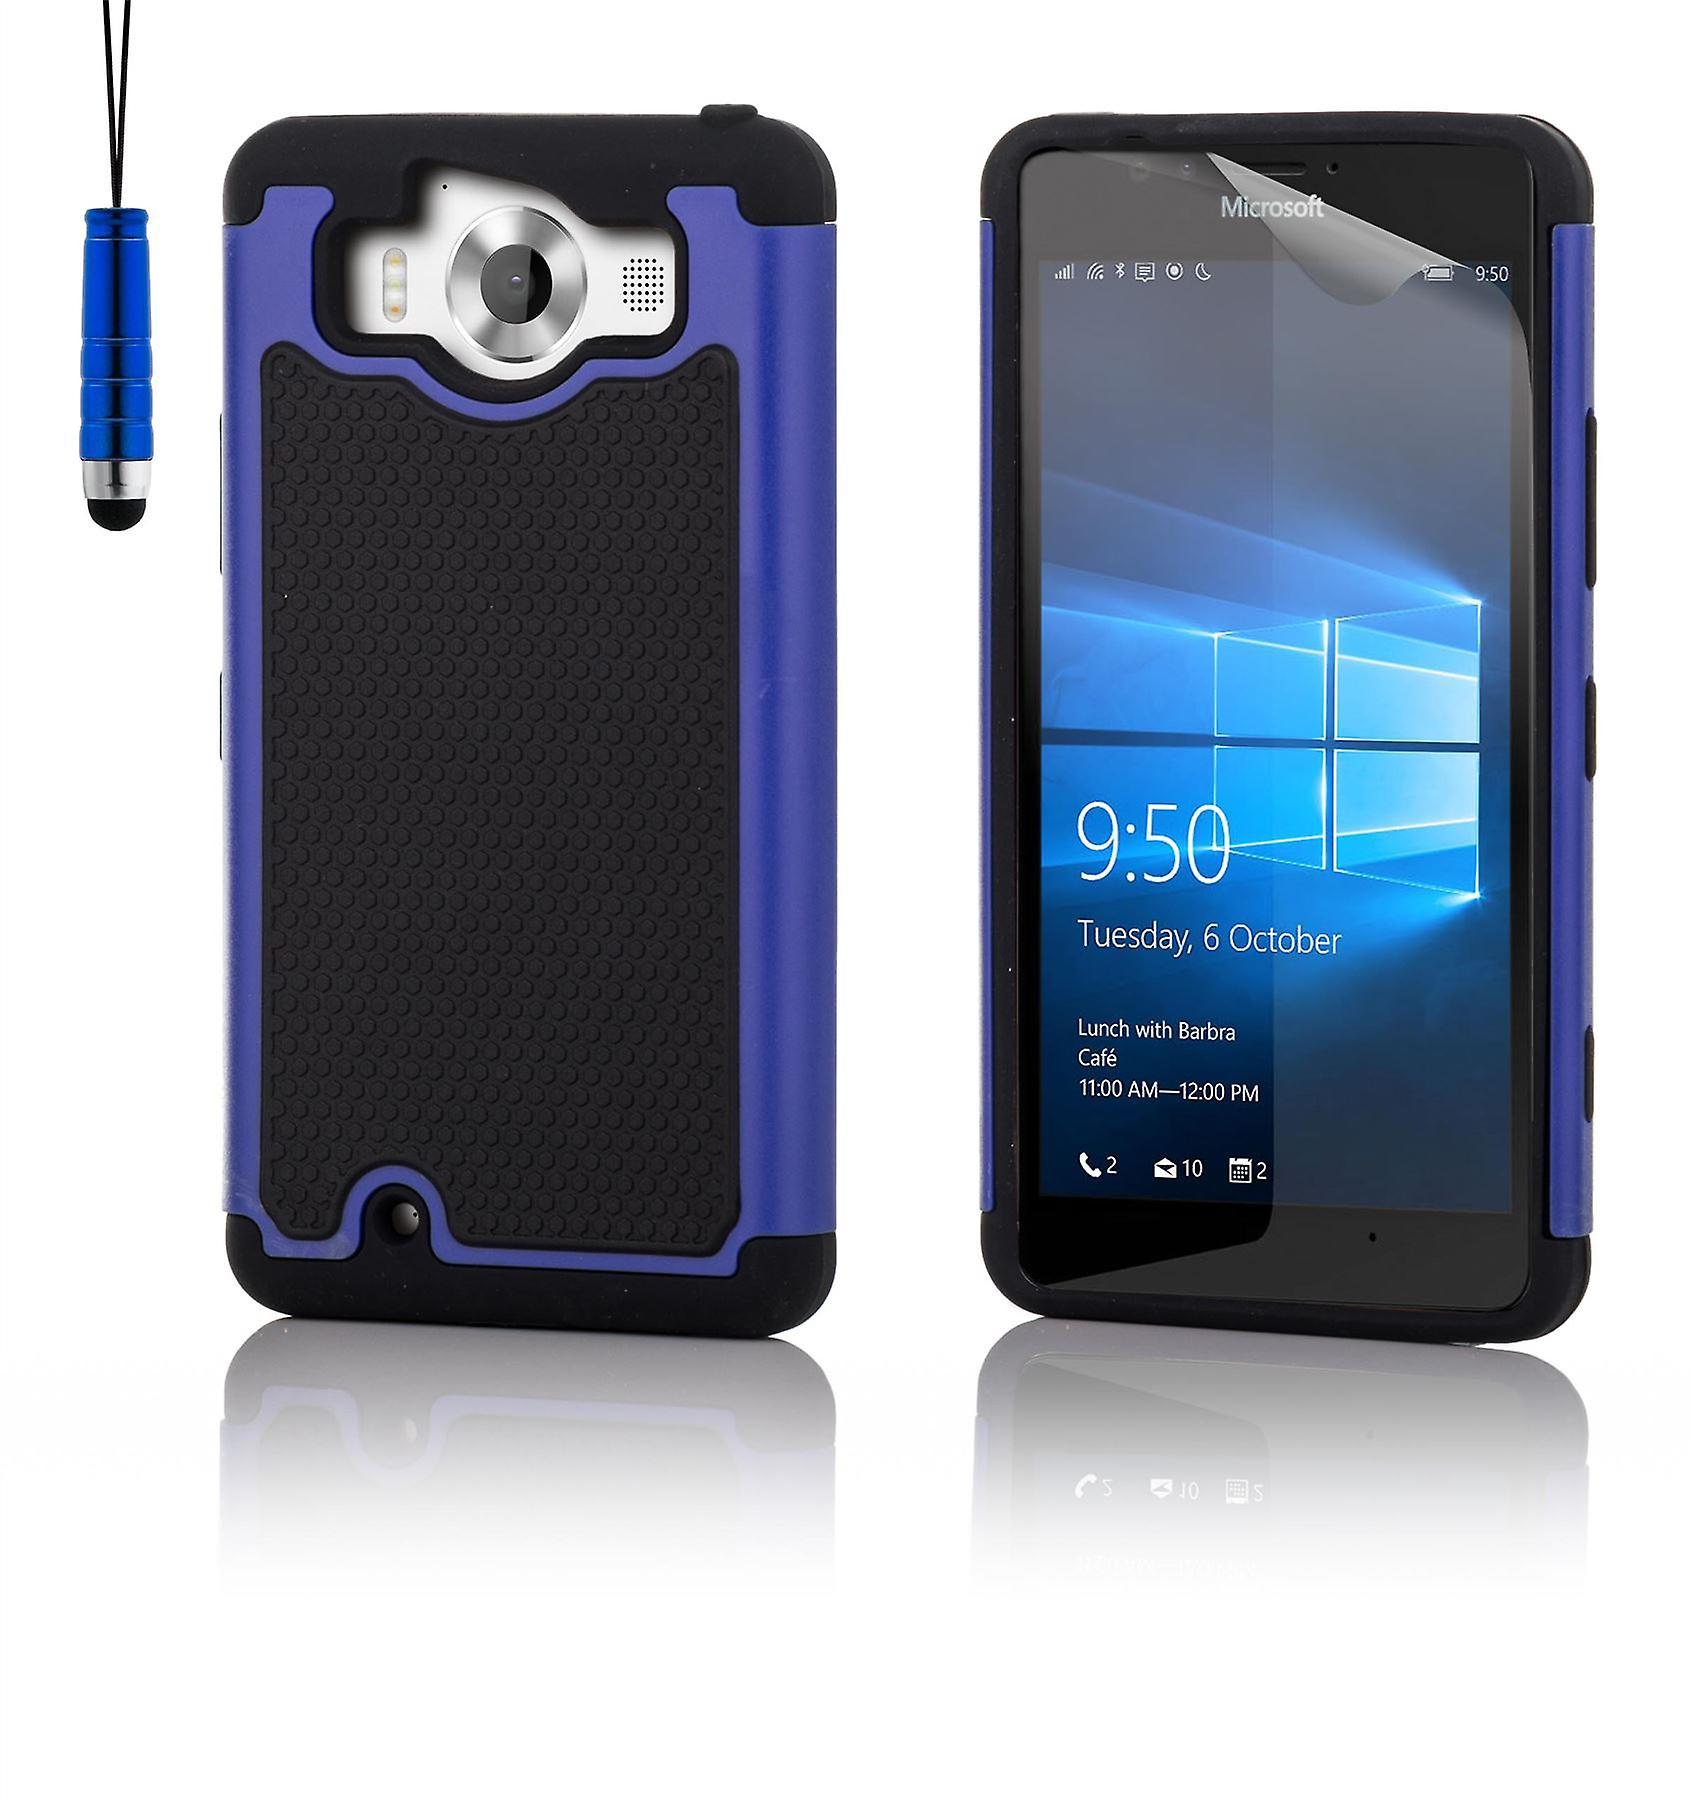 Shock proof case + stylus for Microsoft Lumia 950 - Deep Blue